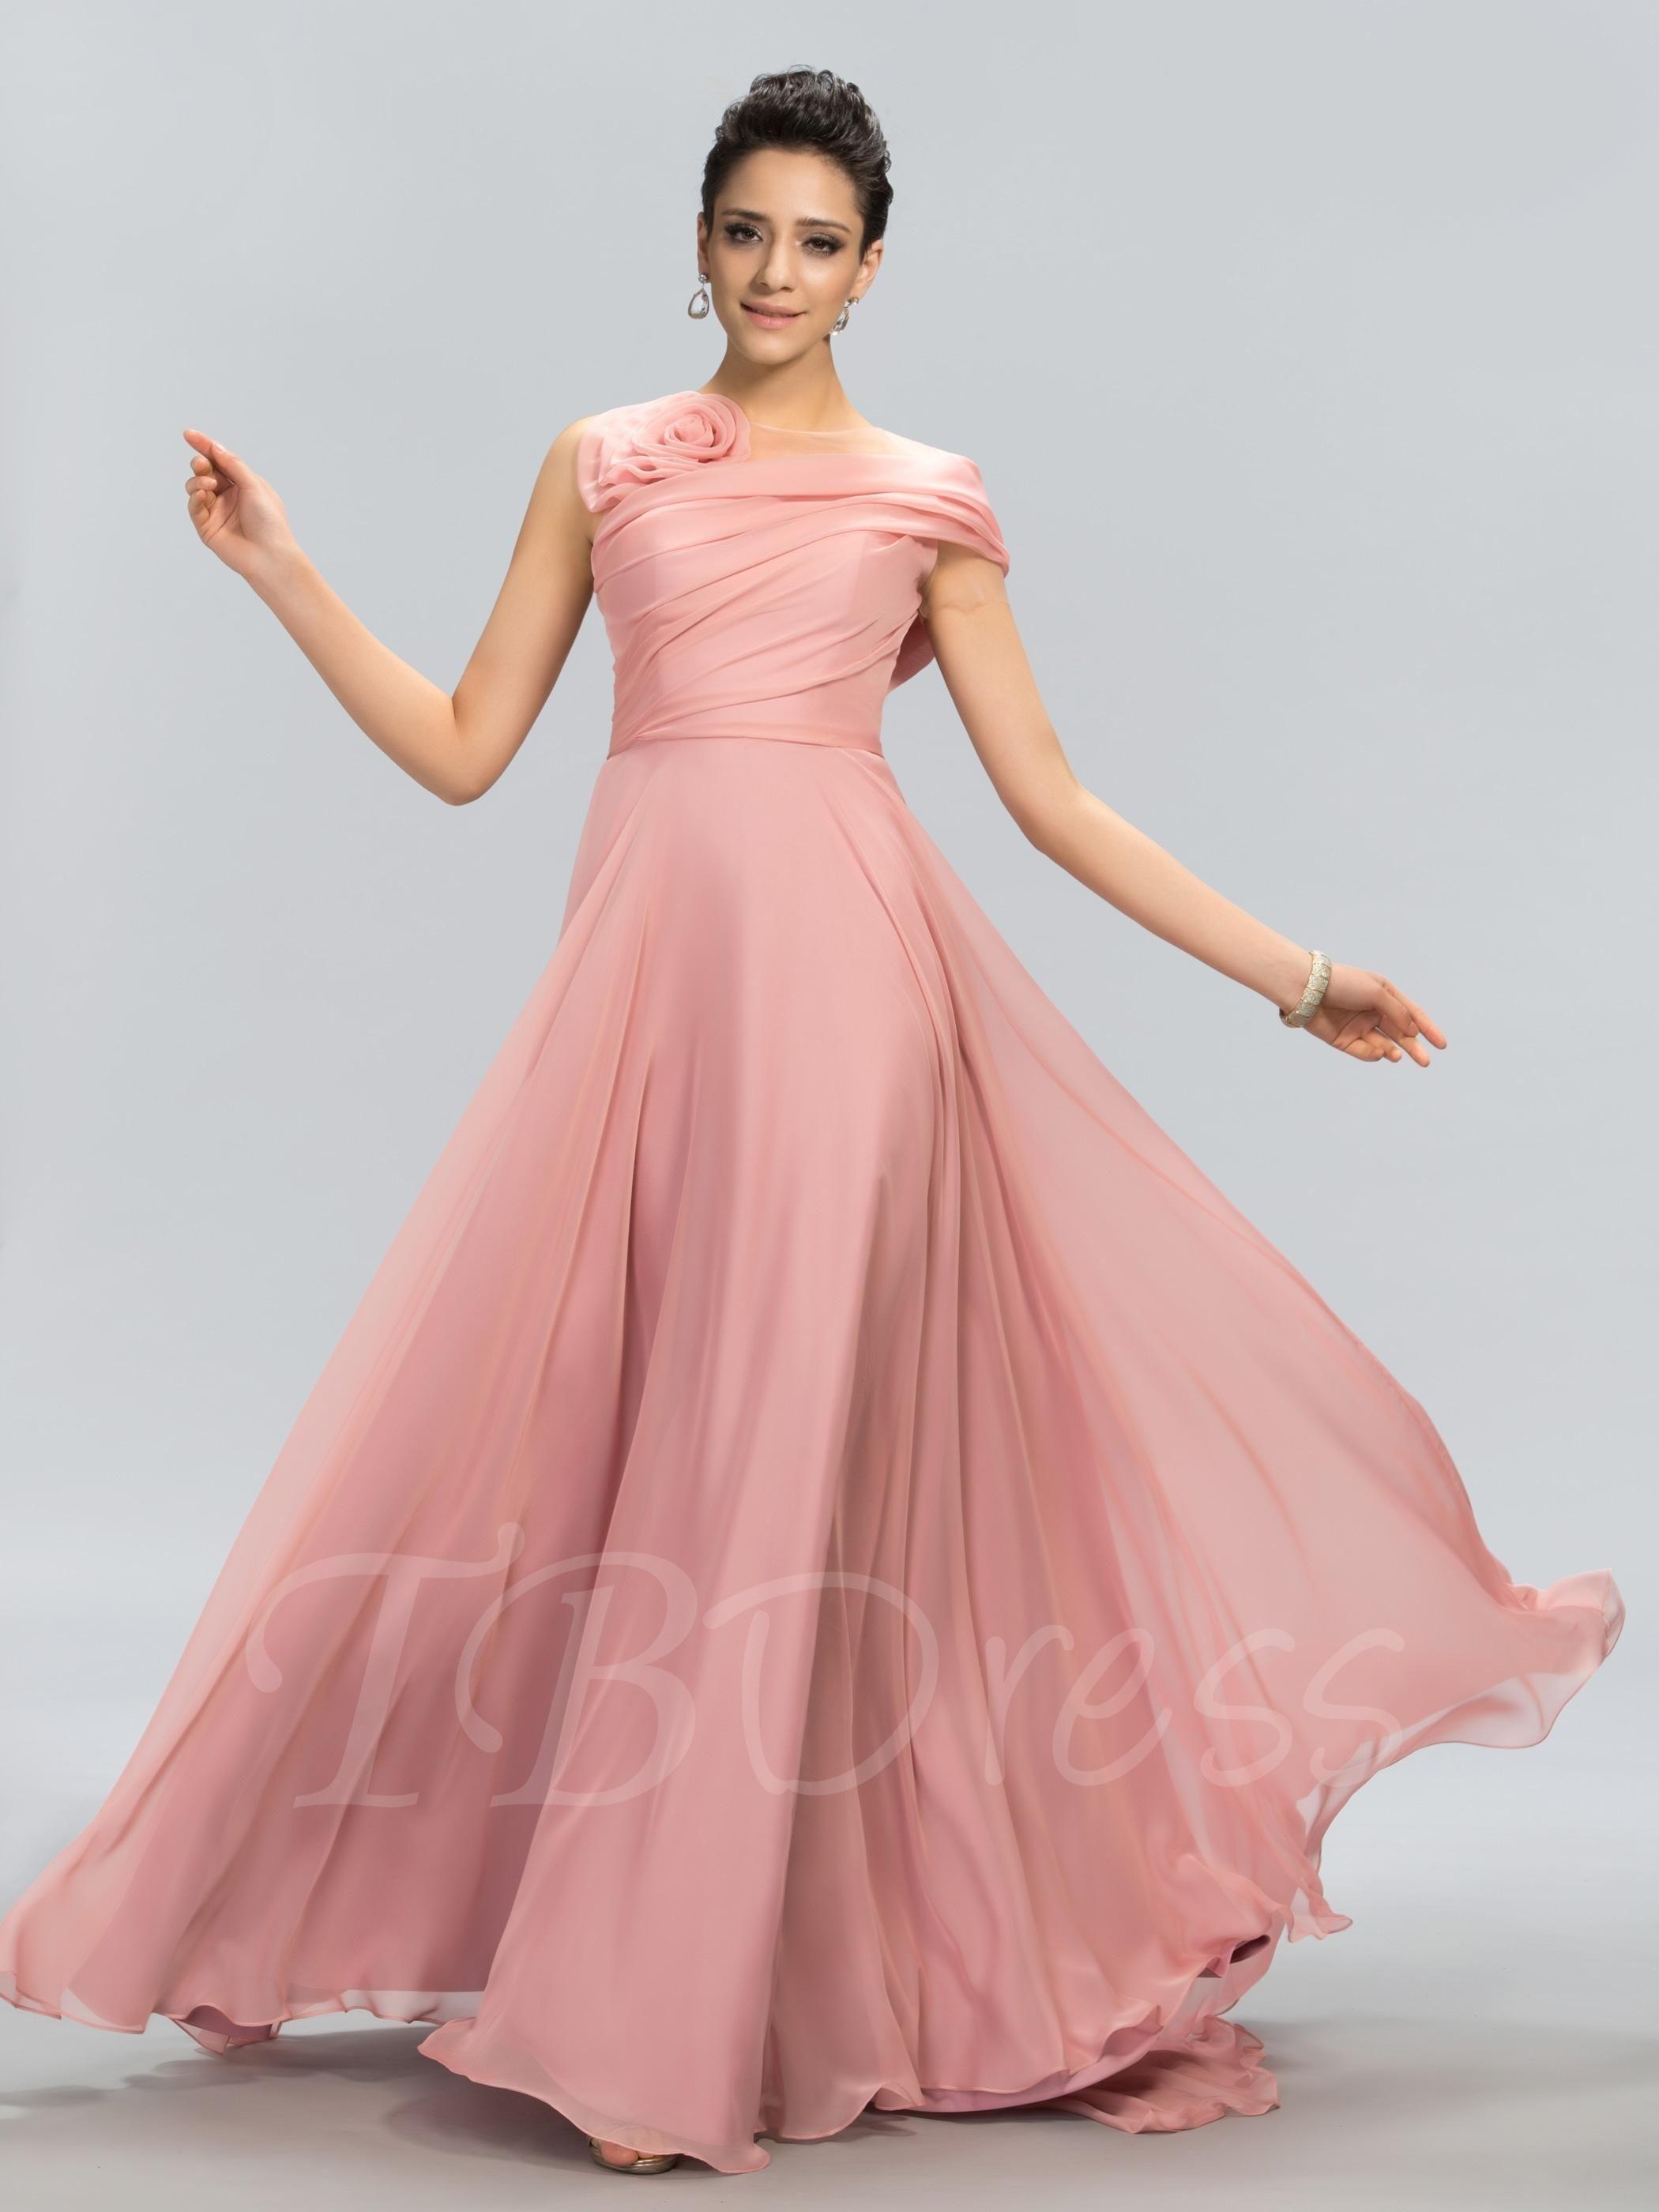 TBDress - TBDress Flower One Shoulder Short Sleeve A-Line Prom Dress ...